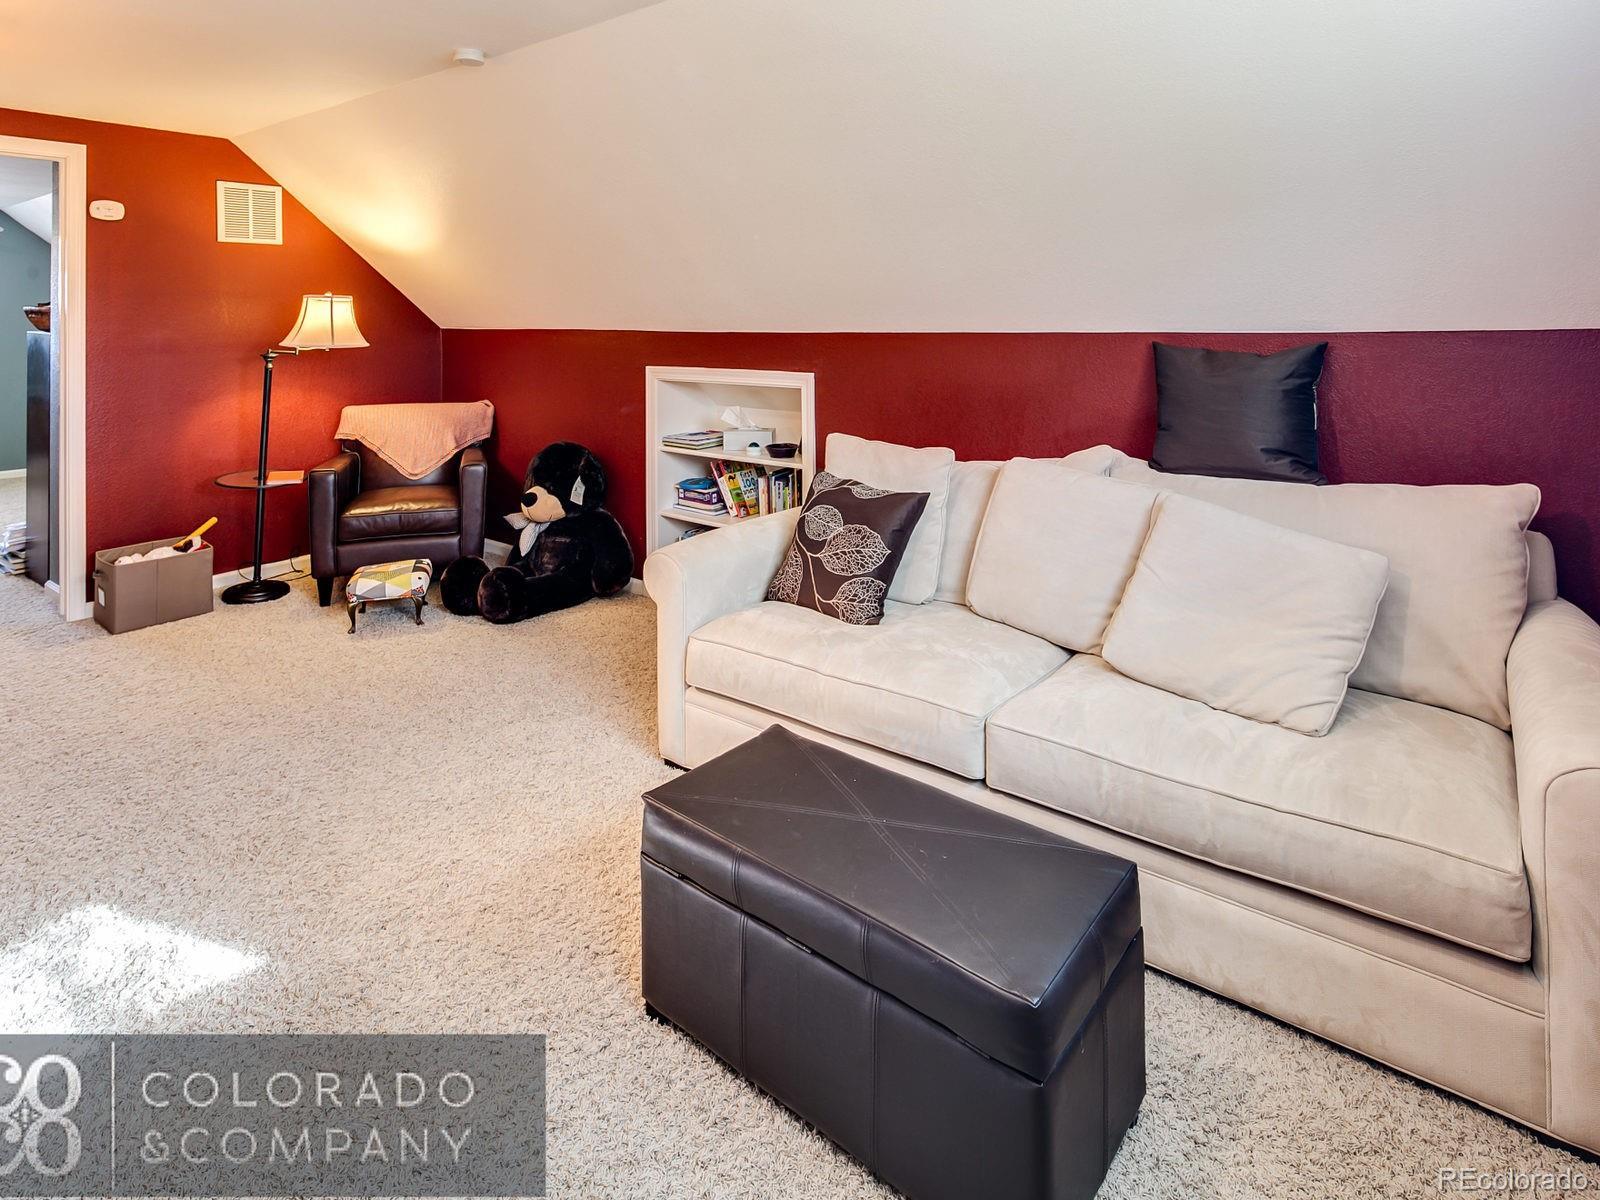 MLS# 9945288 - 16 - 4905 E 36th Avenue, Denver, CO 80207